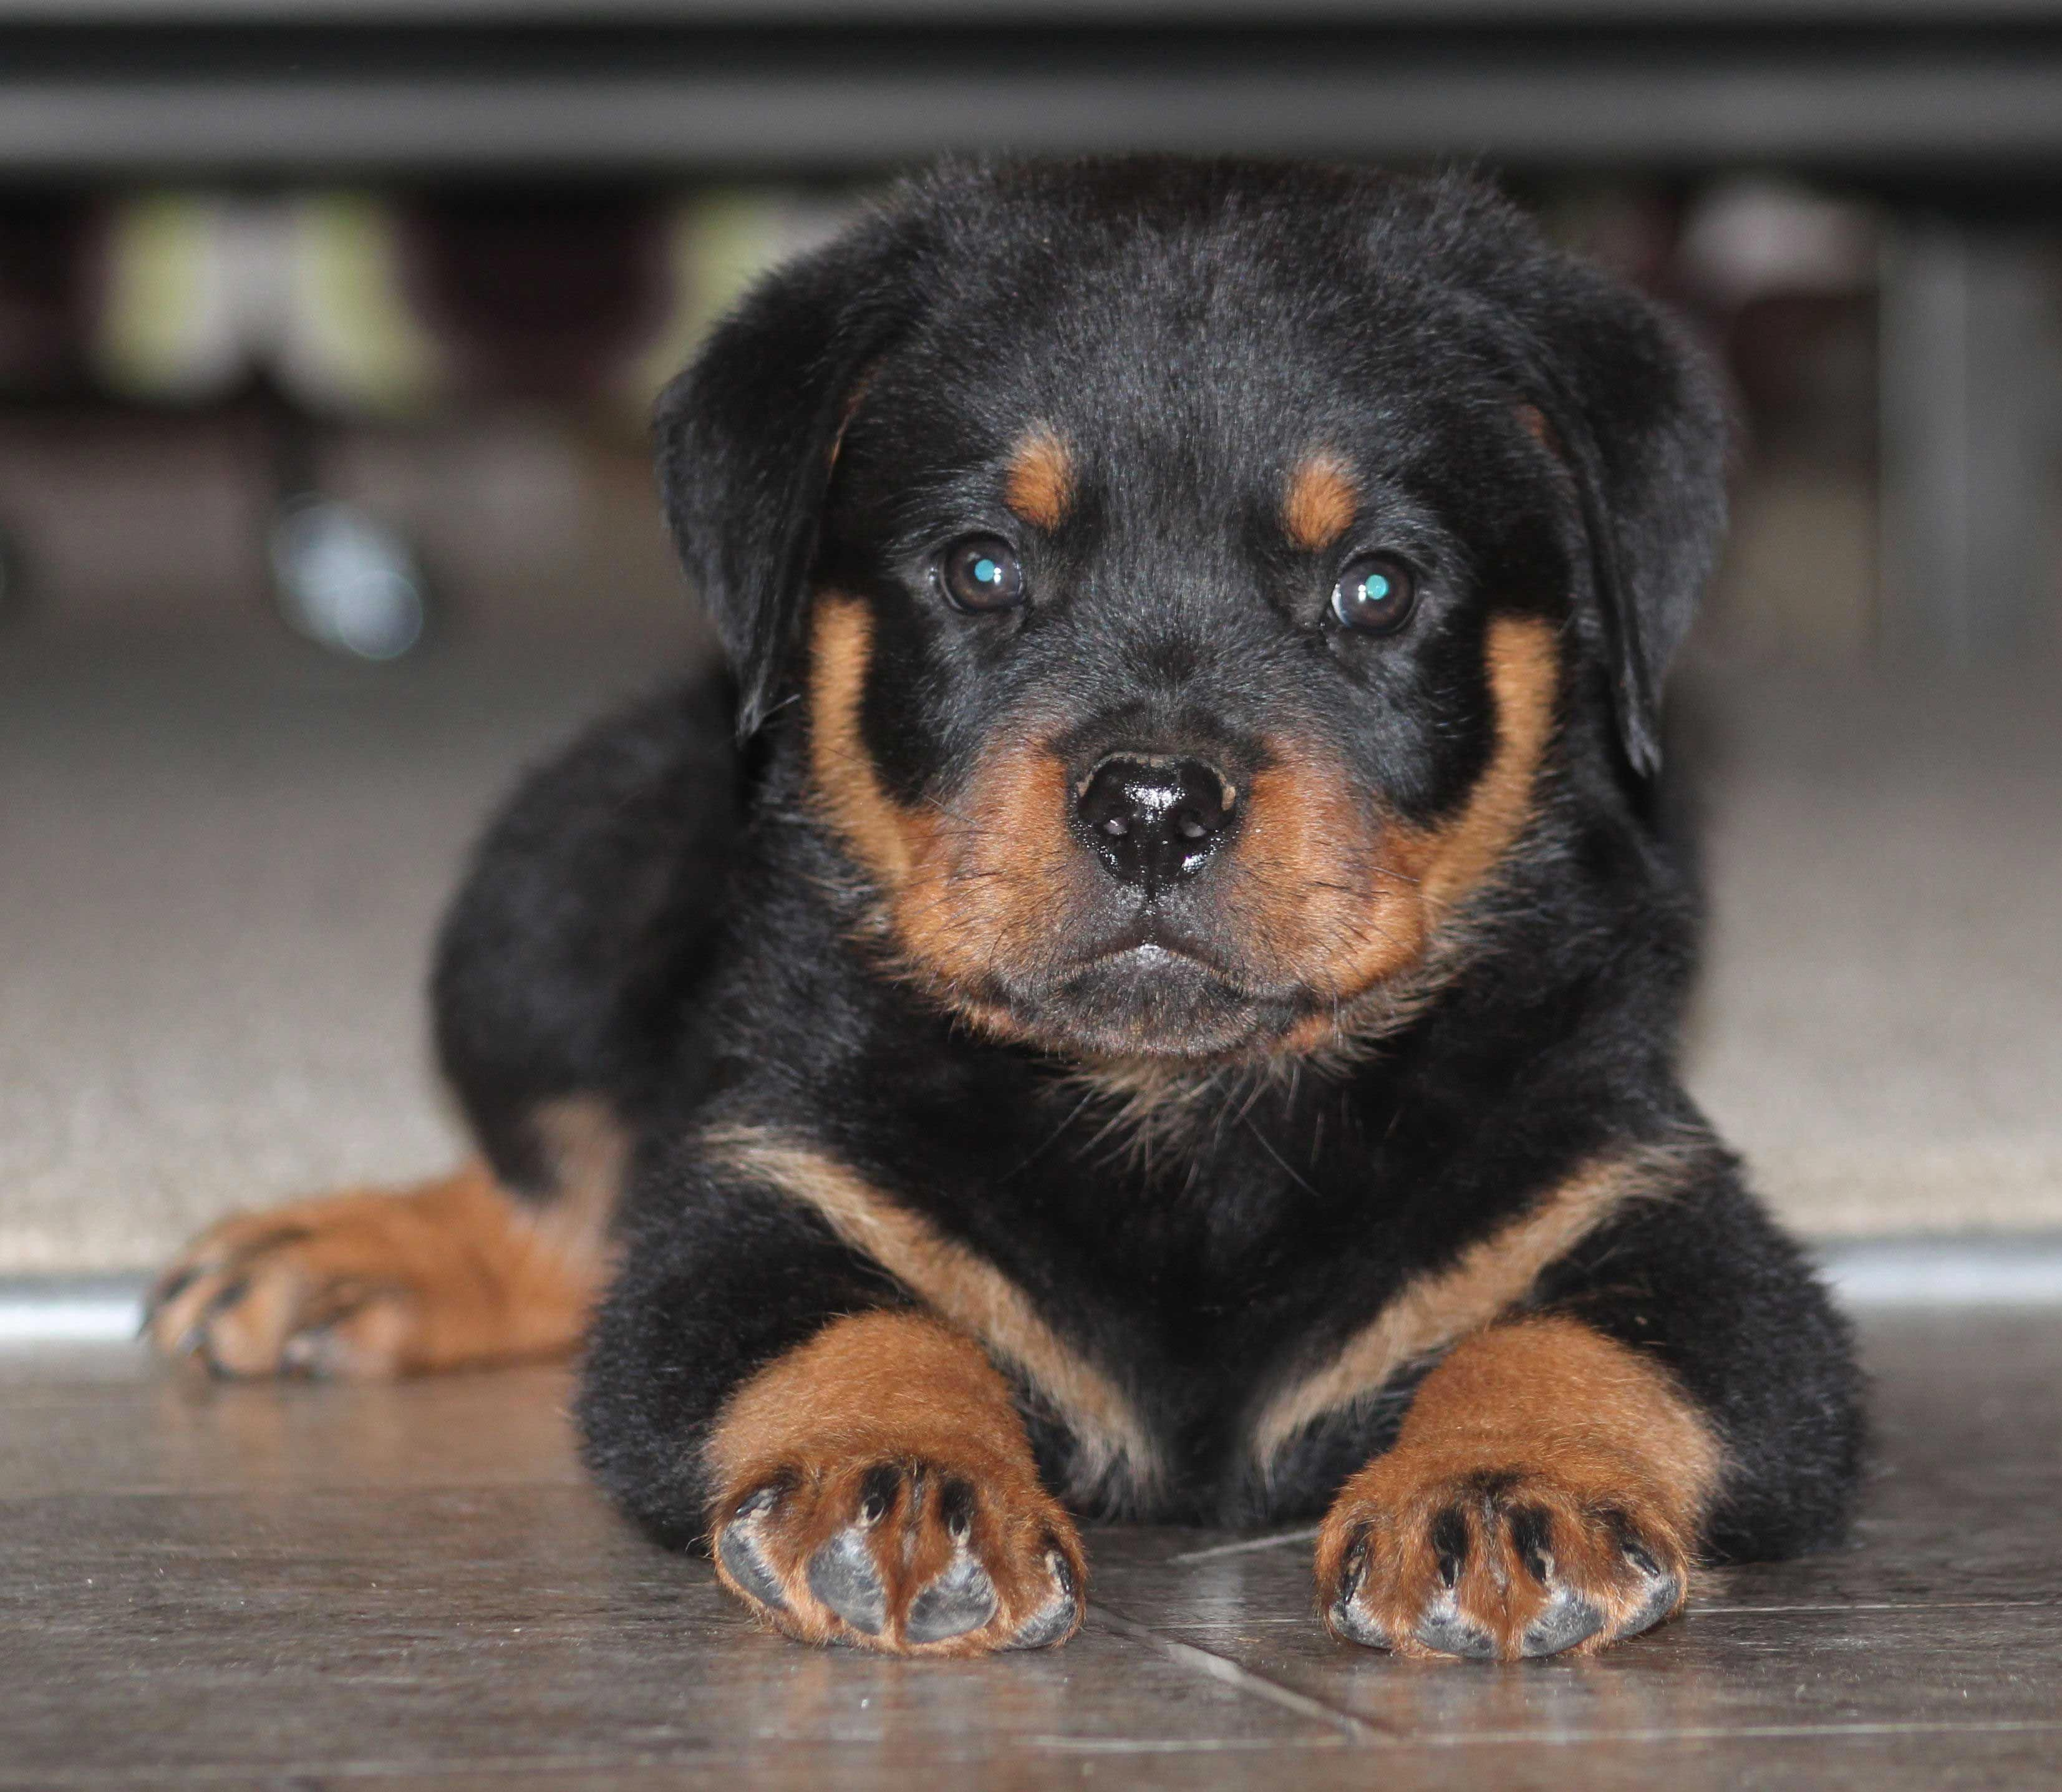 Rottweiler Dog Breed Information Rottweiler Puppies Dog Breeds Rottweiler Dog